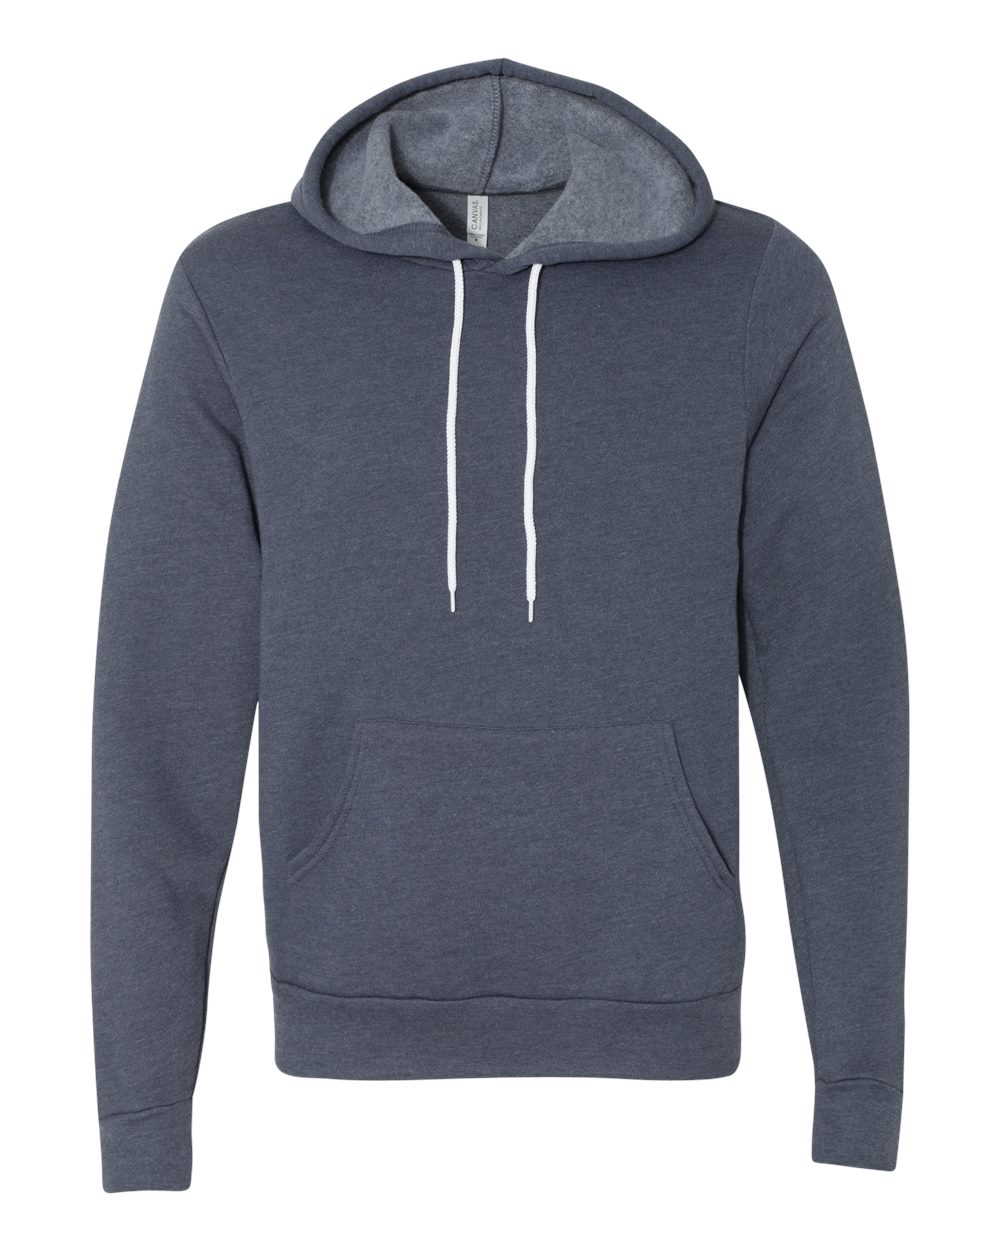 Bella-Canvas-Unisex-Sponge-Hooded-Pullover-Sweatshirt-Blank-3719-up-to-2XL thumbnail 52